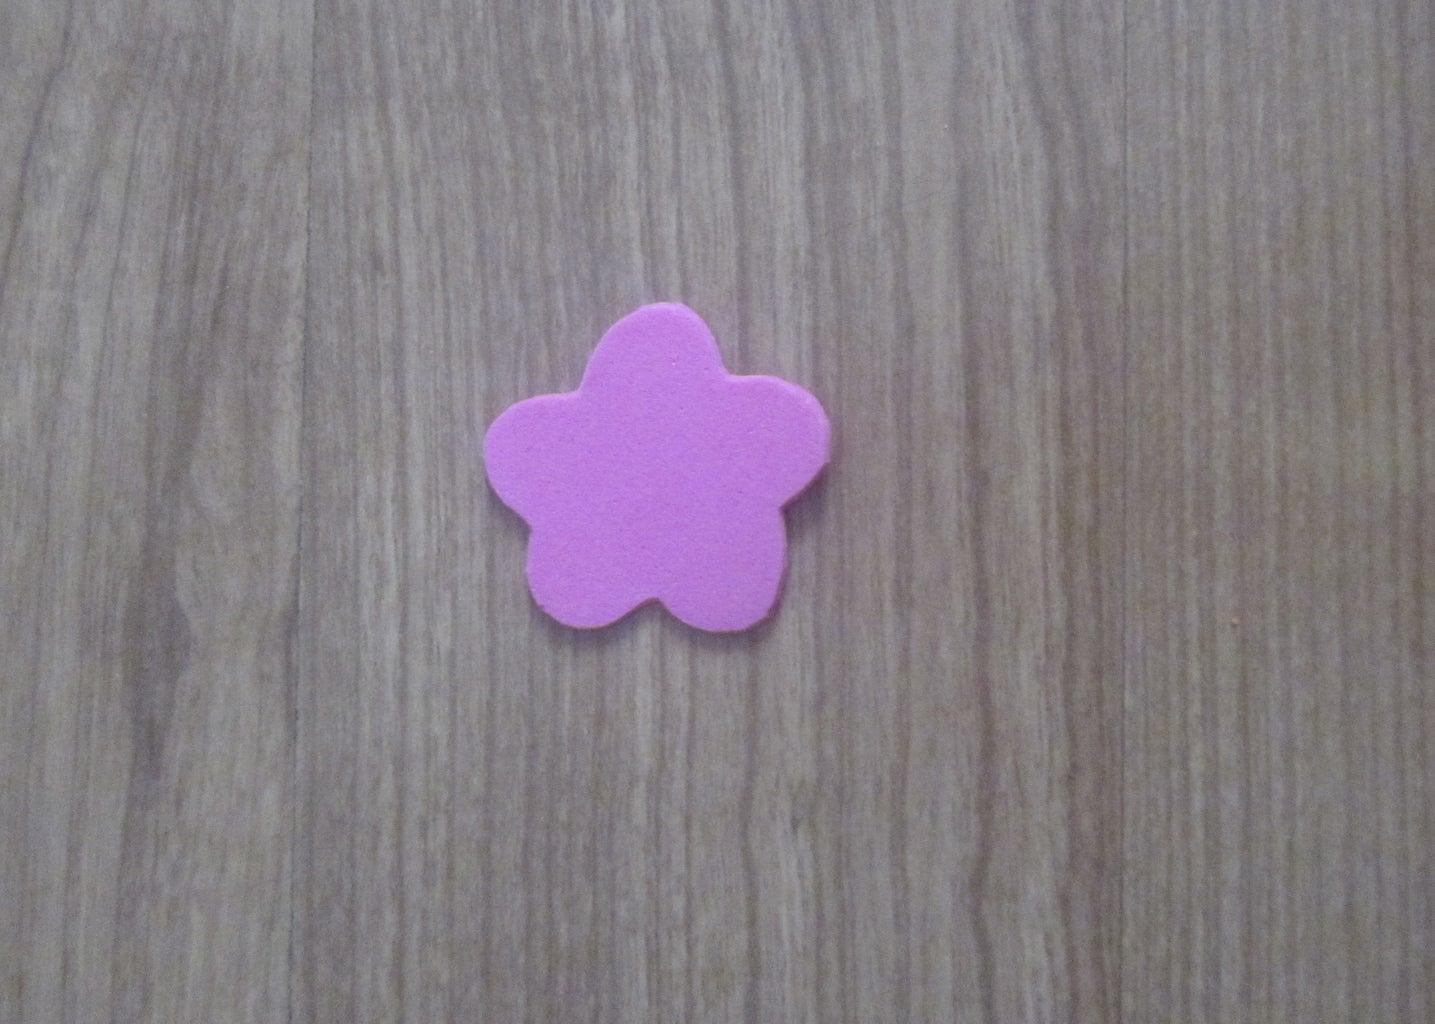 Cut the 5 Petal-flower